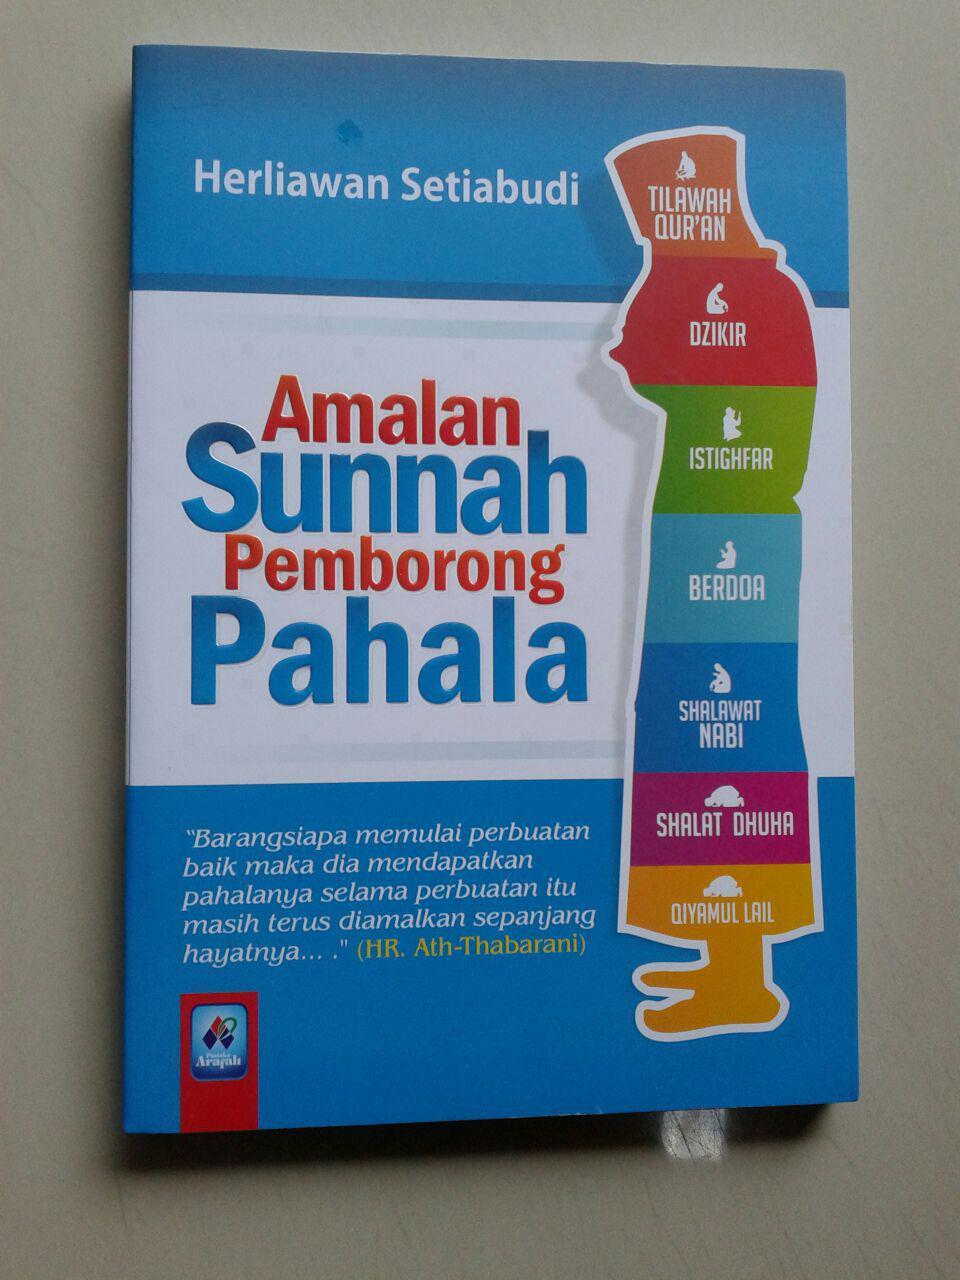 Buku Amalan Sunnah Pemborong Pahala cover 2